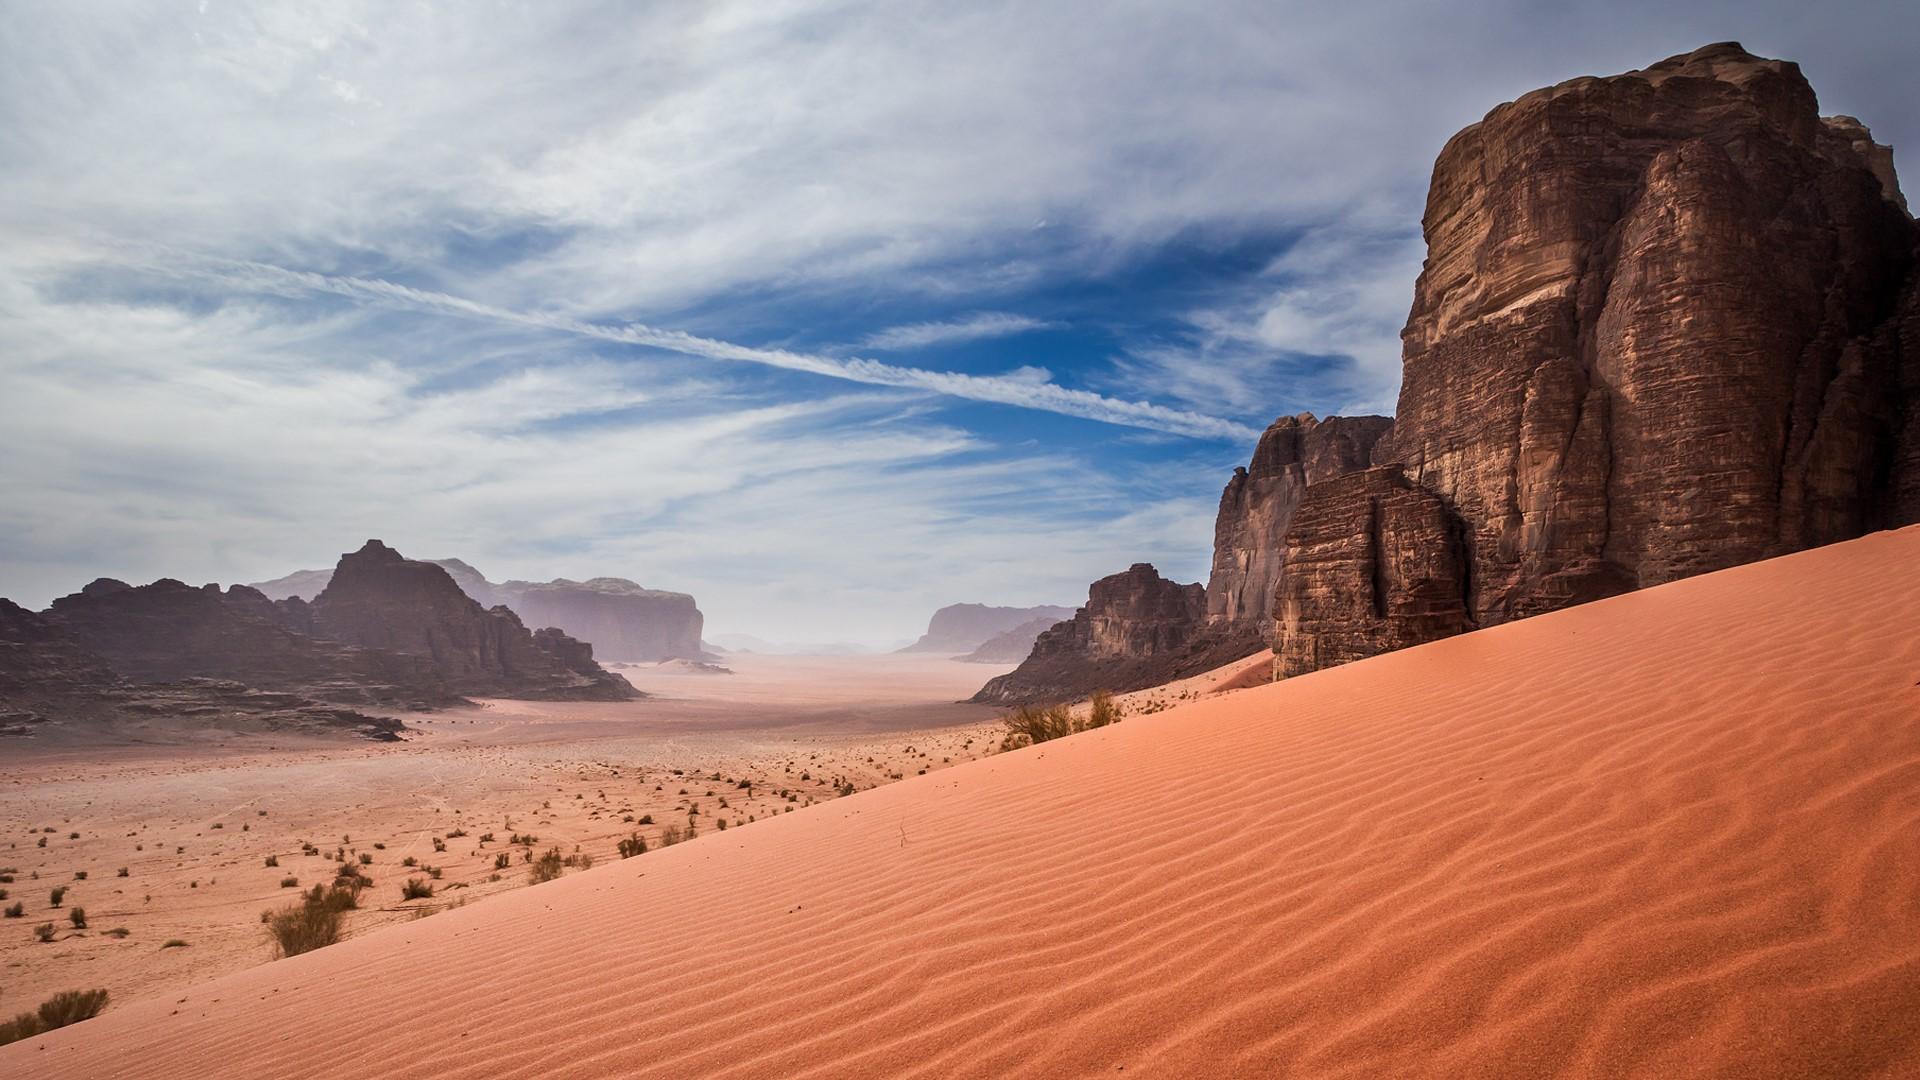 General 1920x1080 nature landscape sand desert dunes Wadi Rum Jordan (country) clouds plants rocks mountains